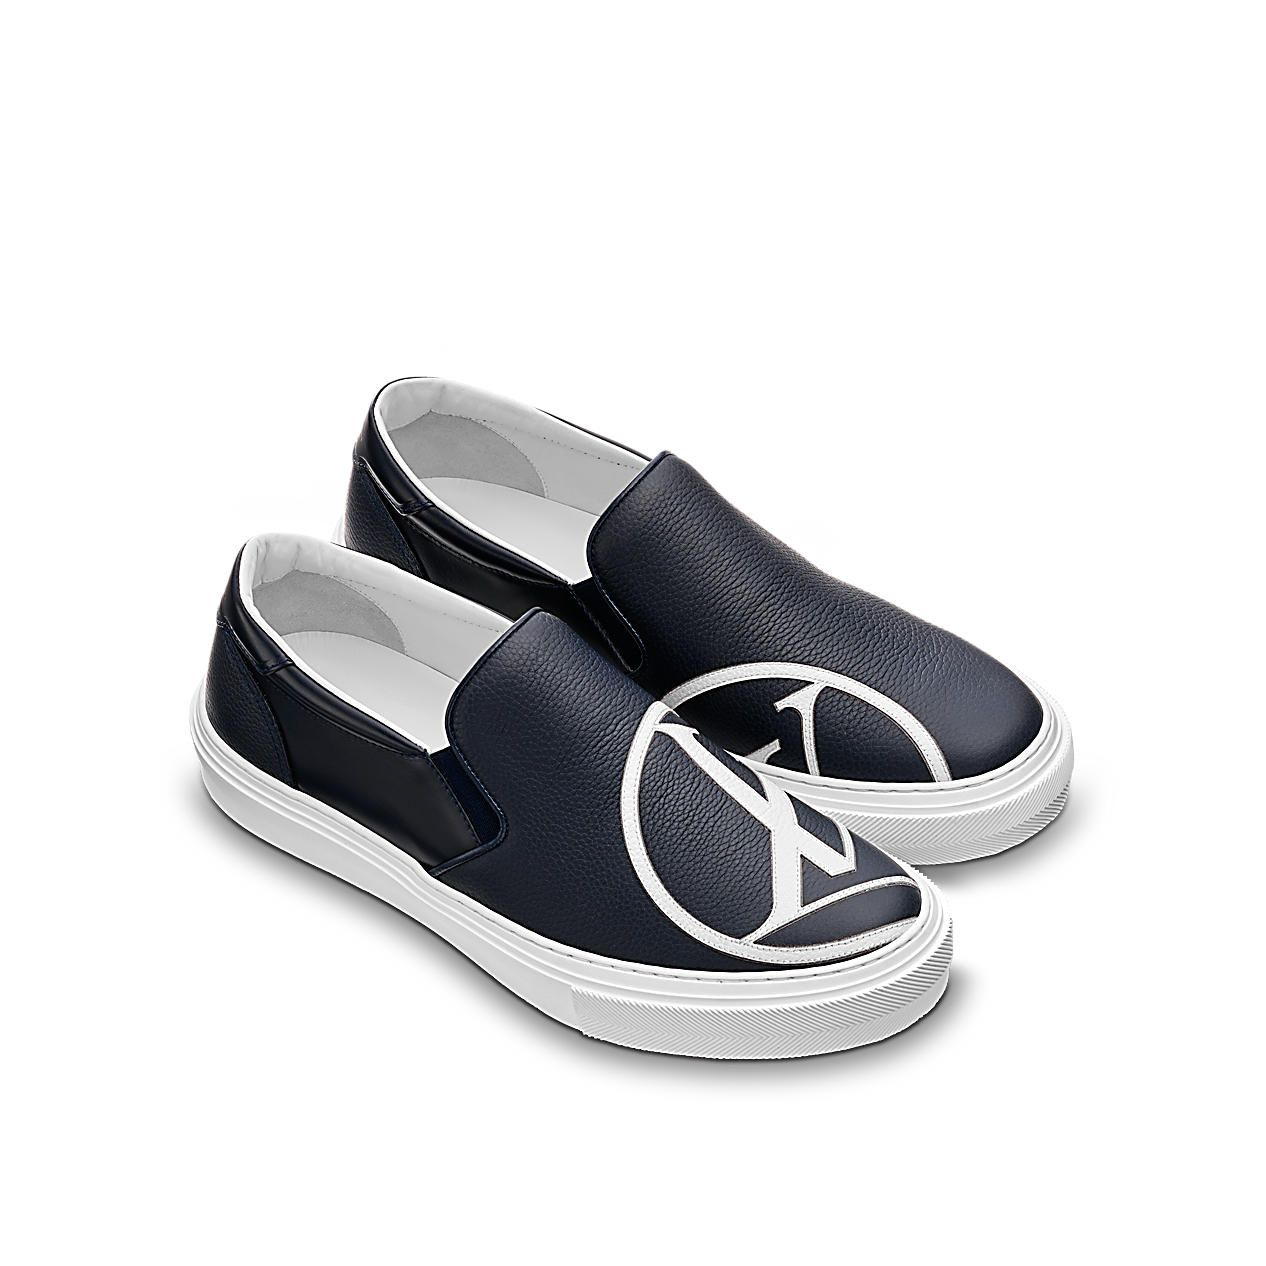 SHOES Trocadero Slip On | Louis Vuitton